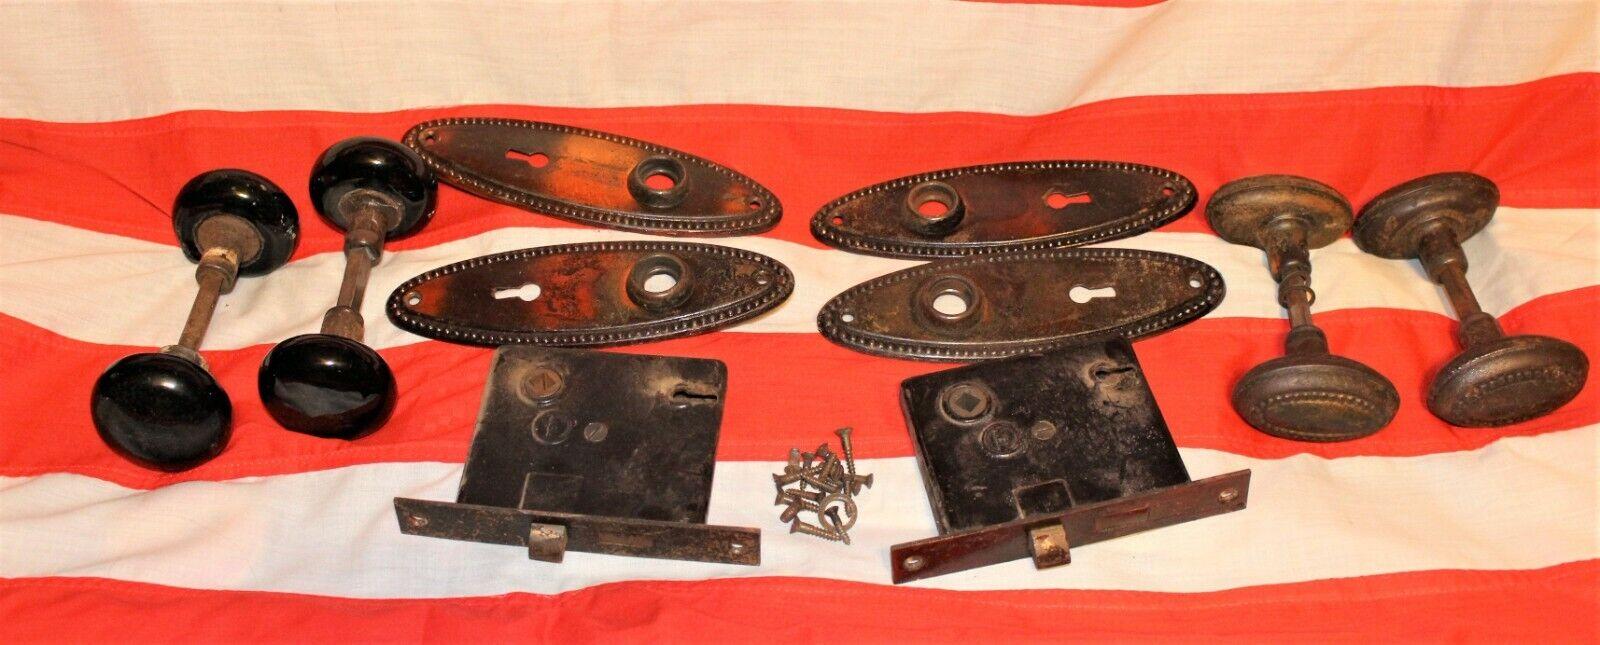 Vintage Door Hardware Mortise Locks - Door Knobs Plates NO KEYS  - $20.00